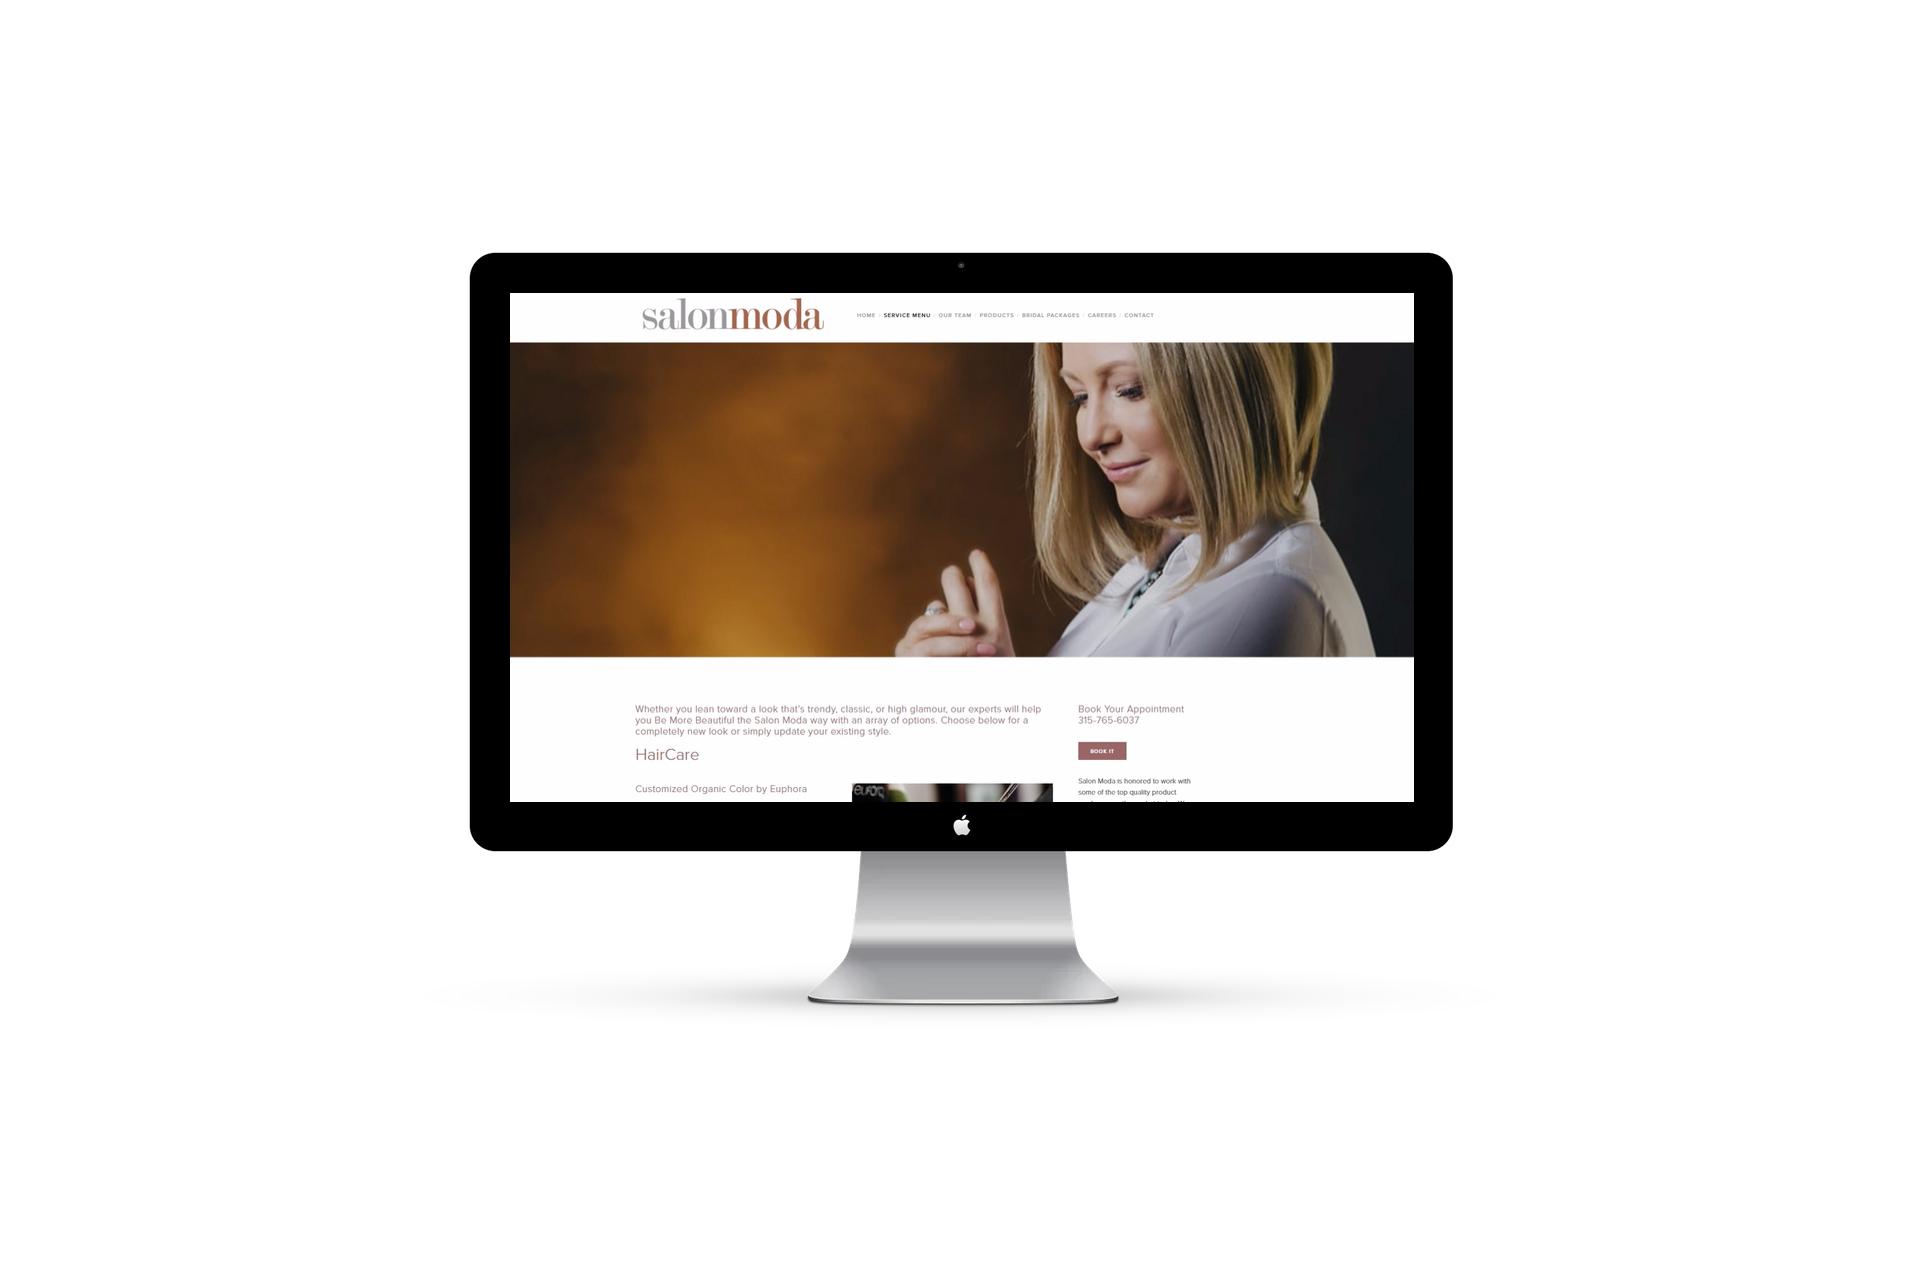 Hair salon website design